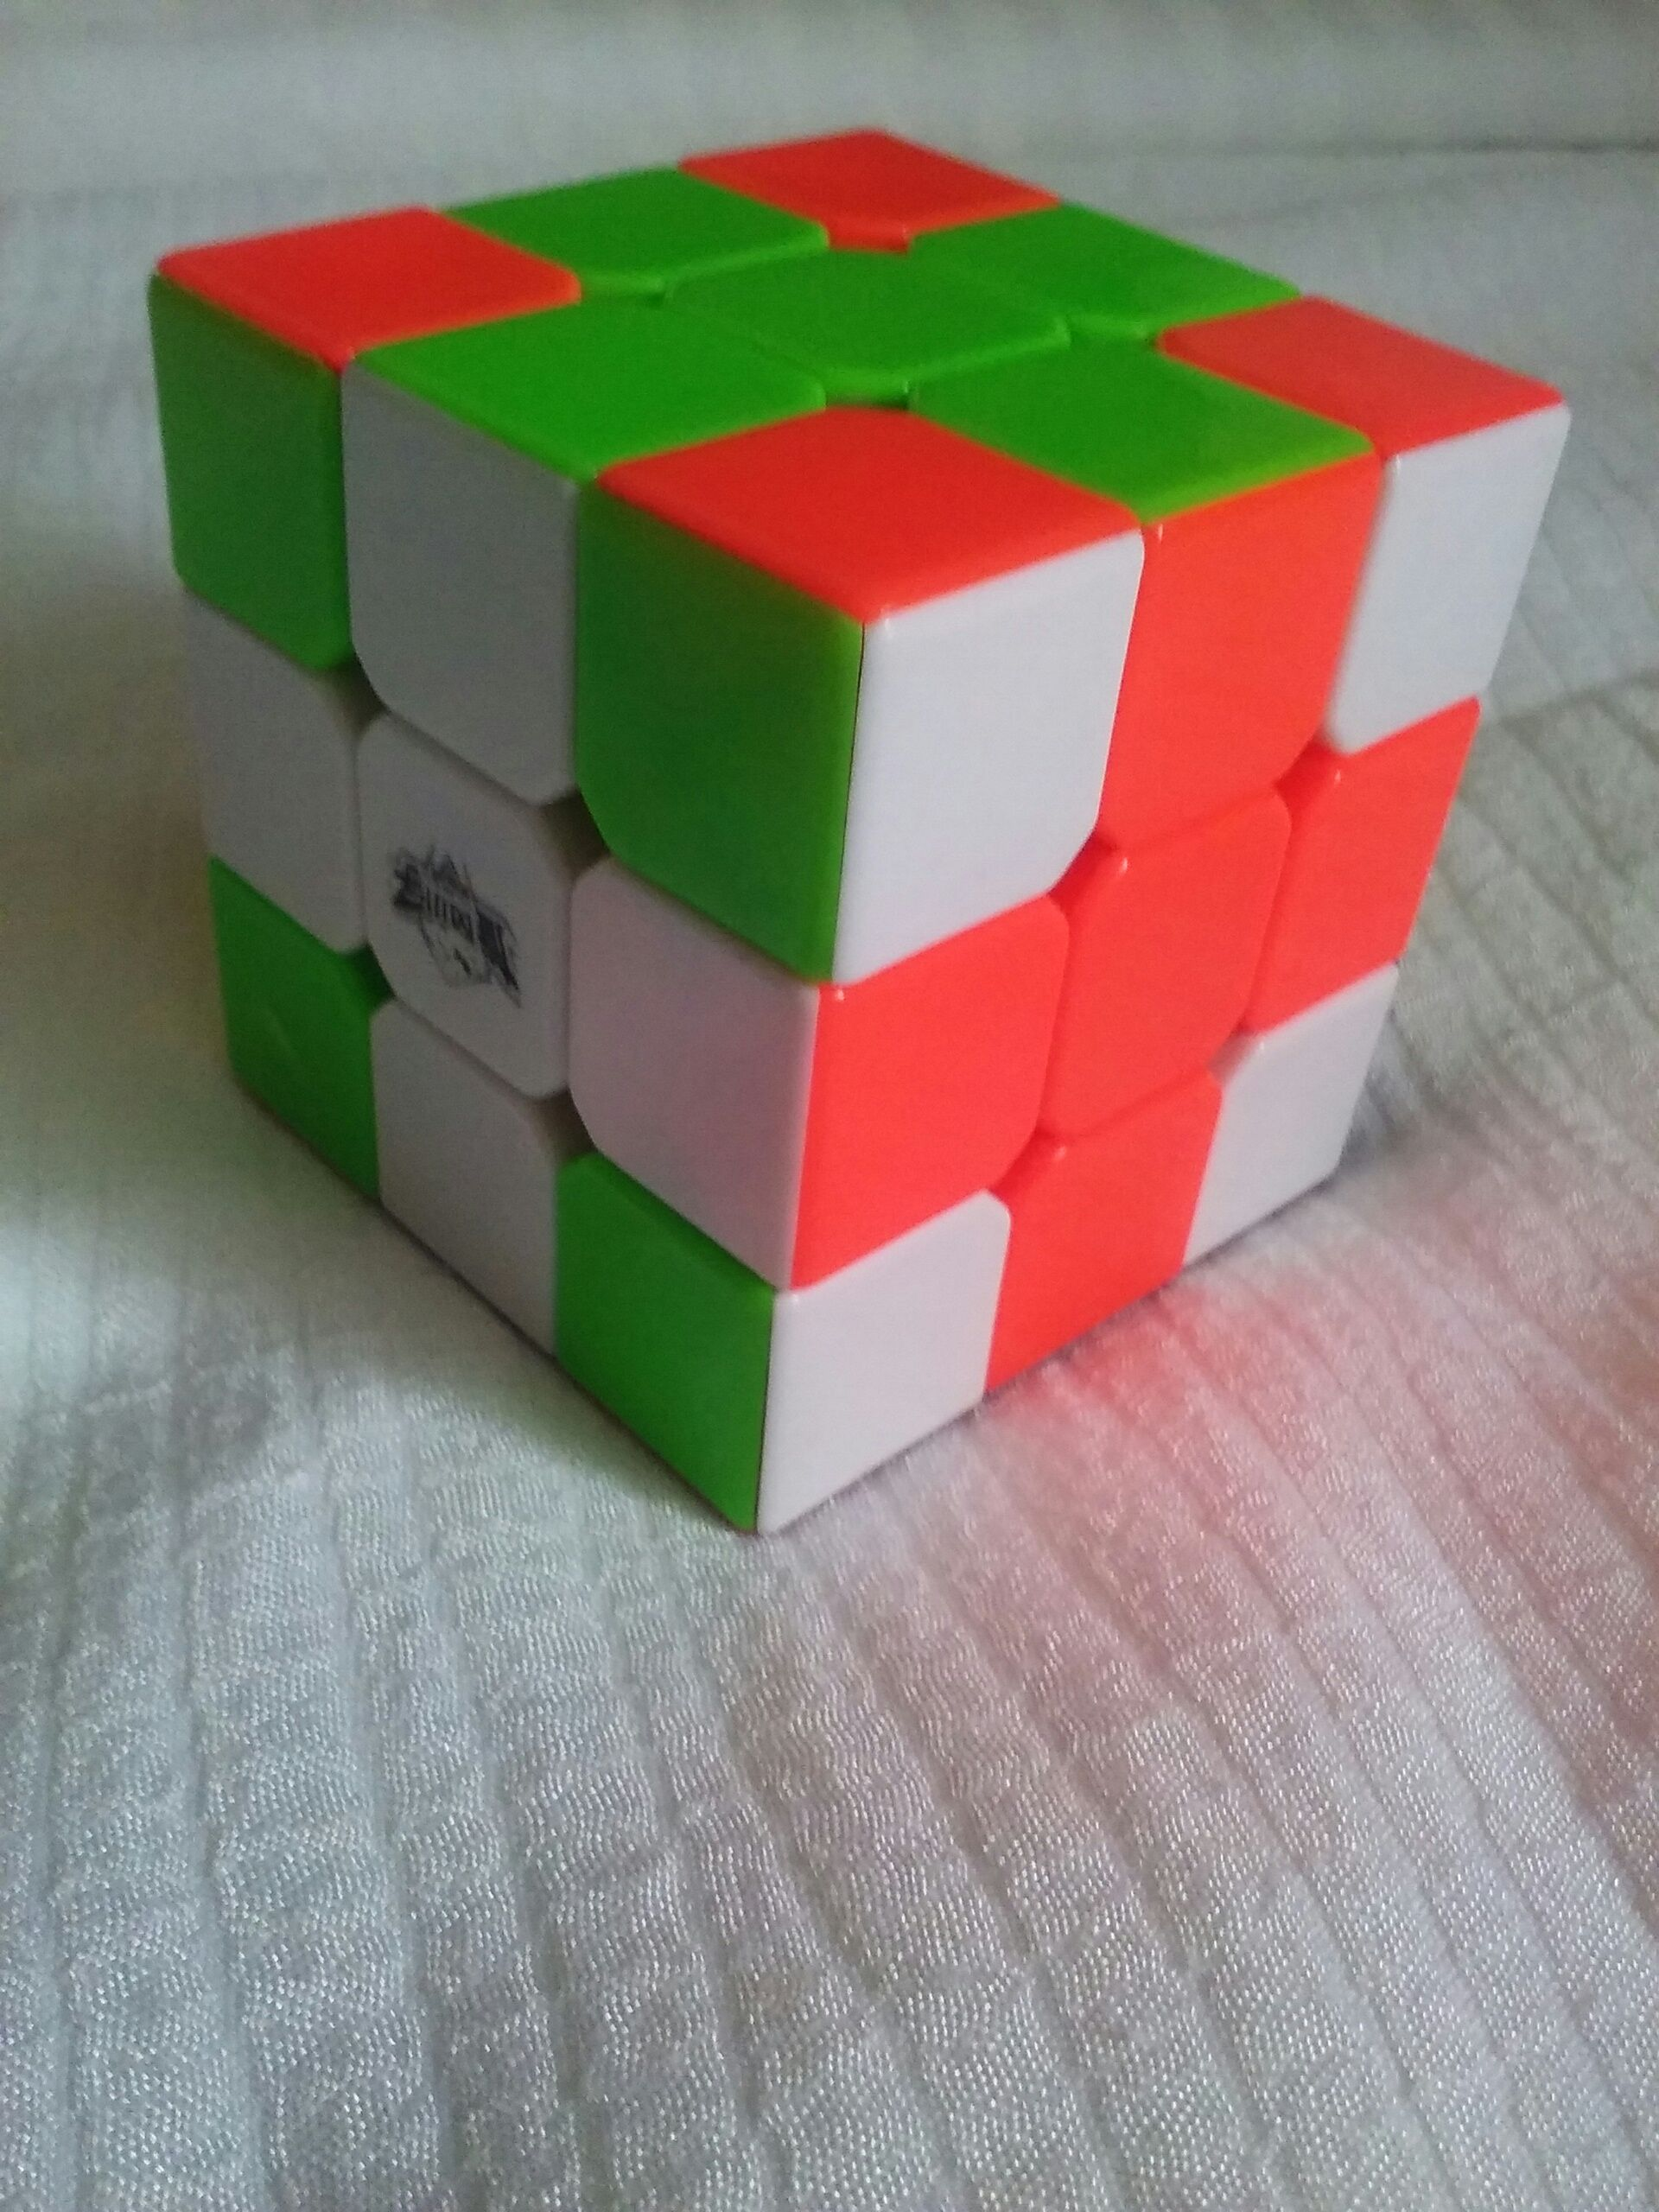 Rubiks Cube Tricks: Cross 4